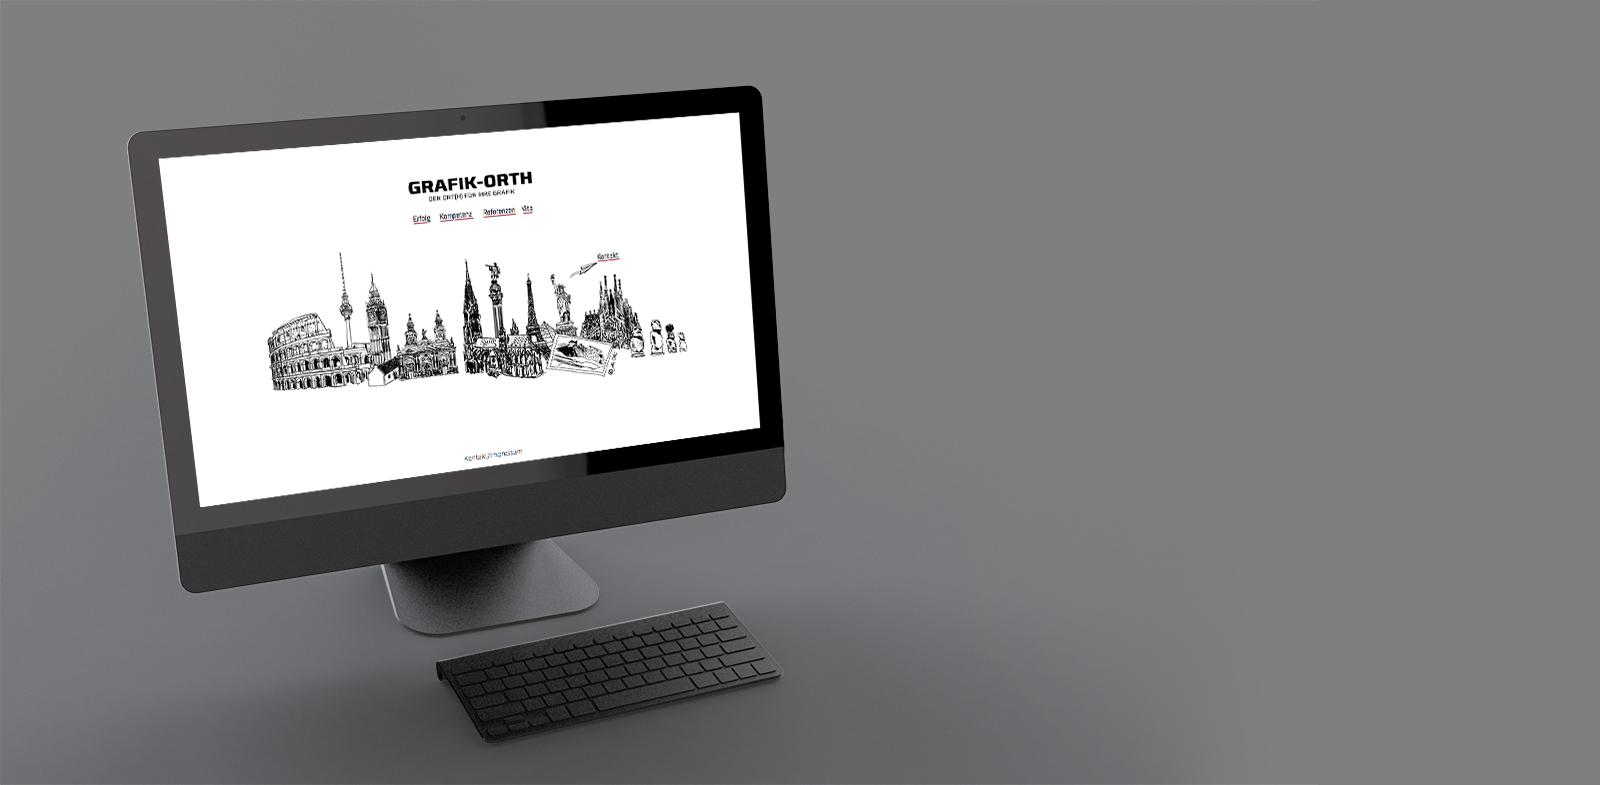 grafik orth kreativwirtschaft freiburg. Black Bedroom Furniture Sets. Home Design Ideas